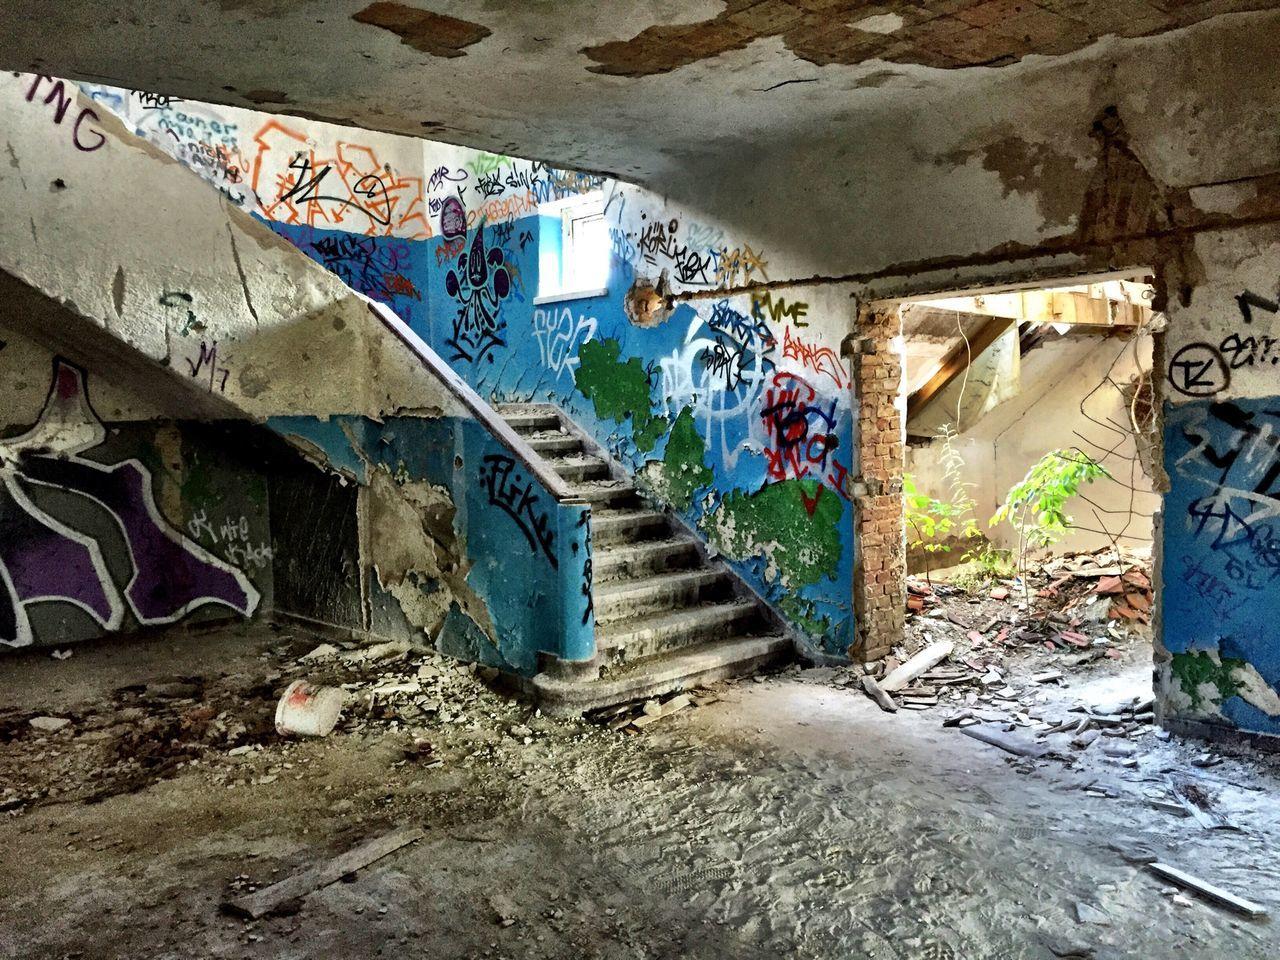 Graffiti in abandoned house